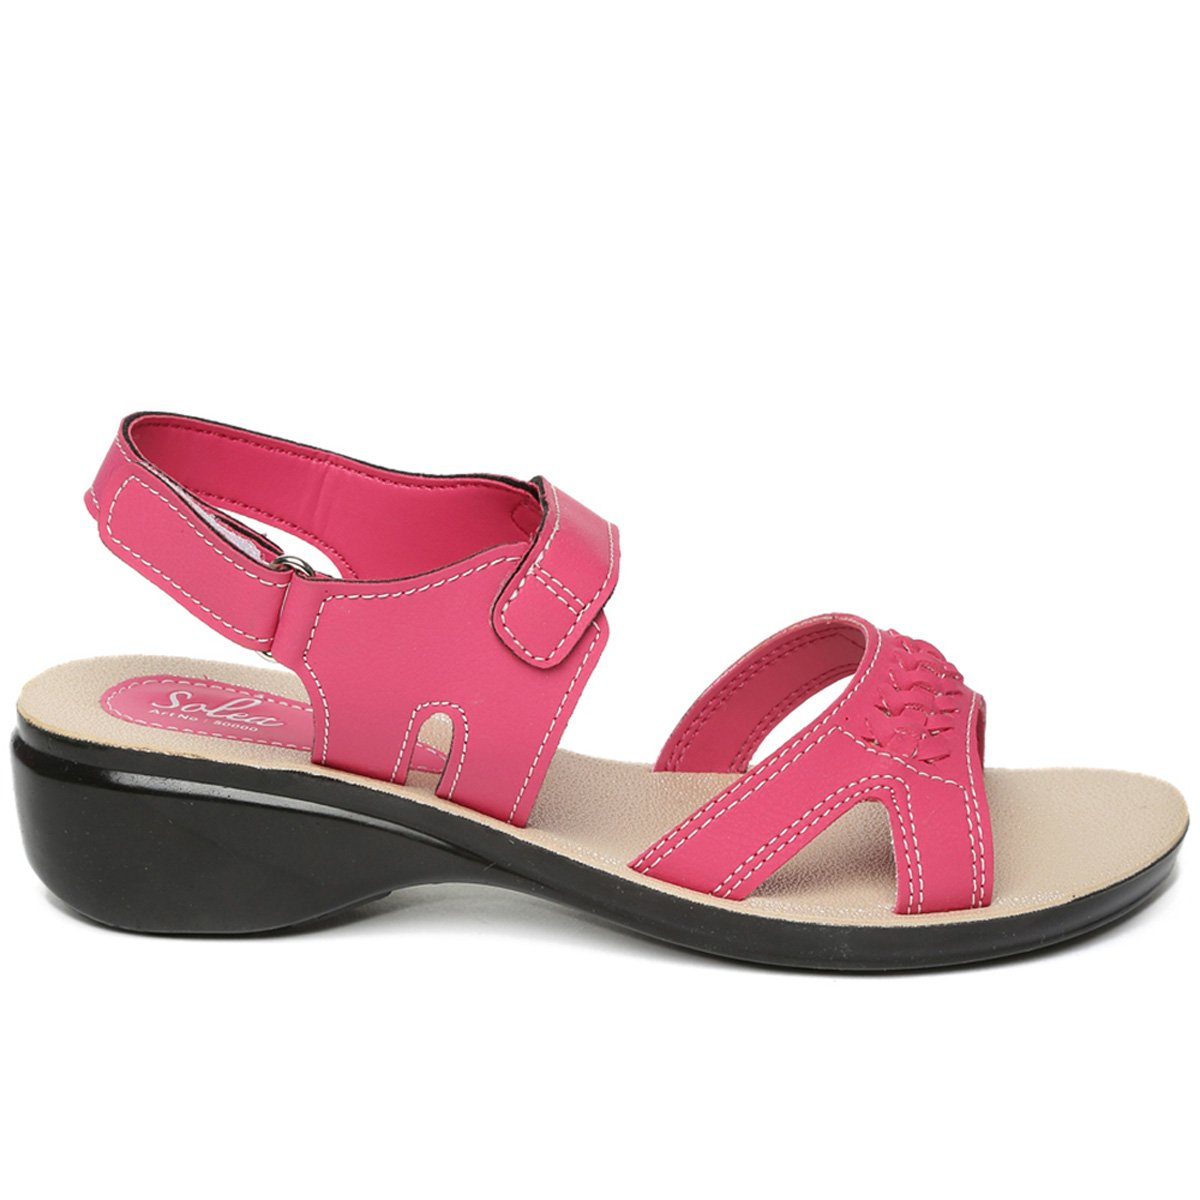 05faeadff09f7 PARAGON SOLEA Women's Pink Sandals